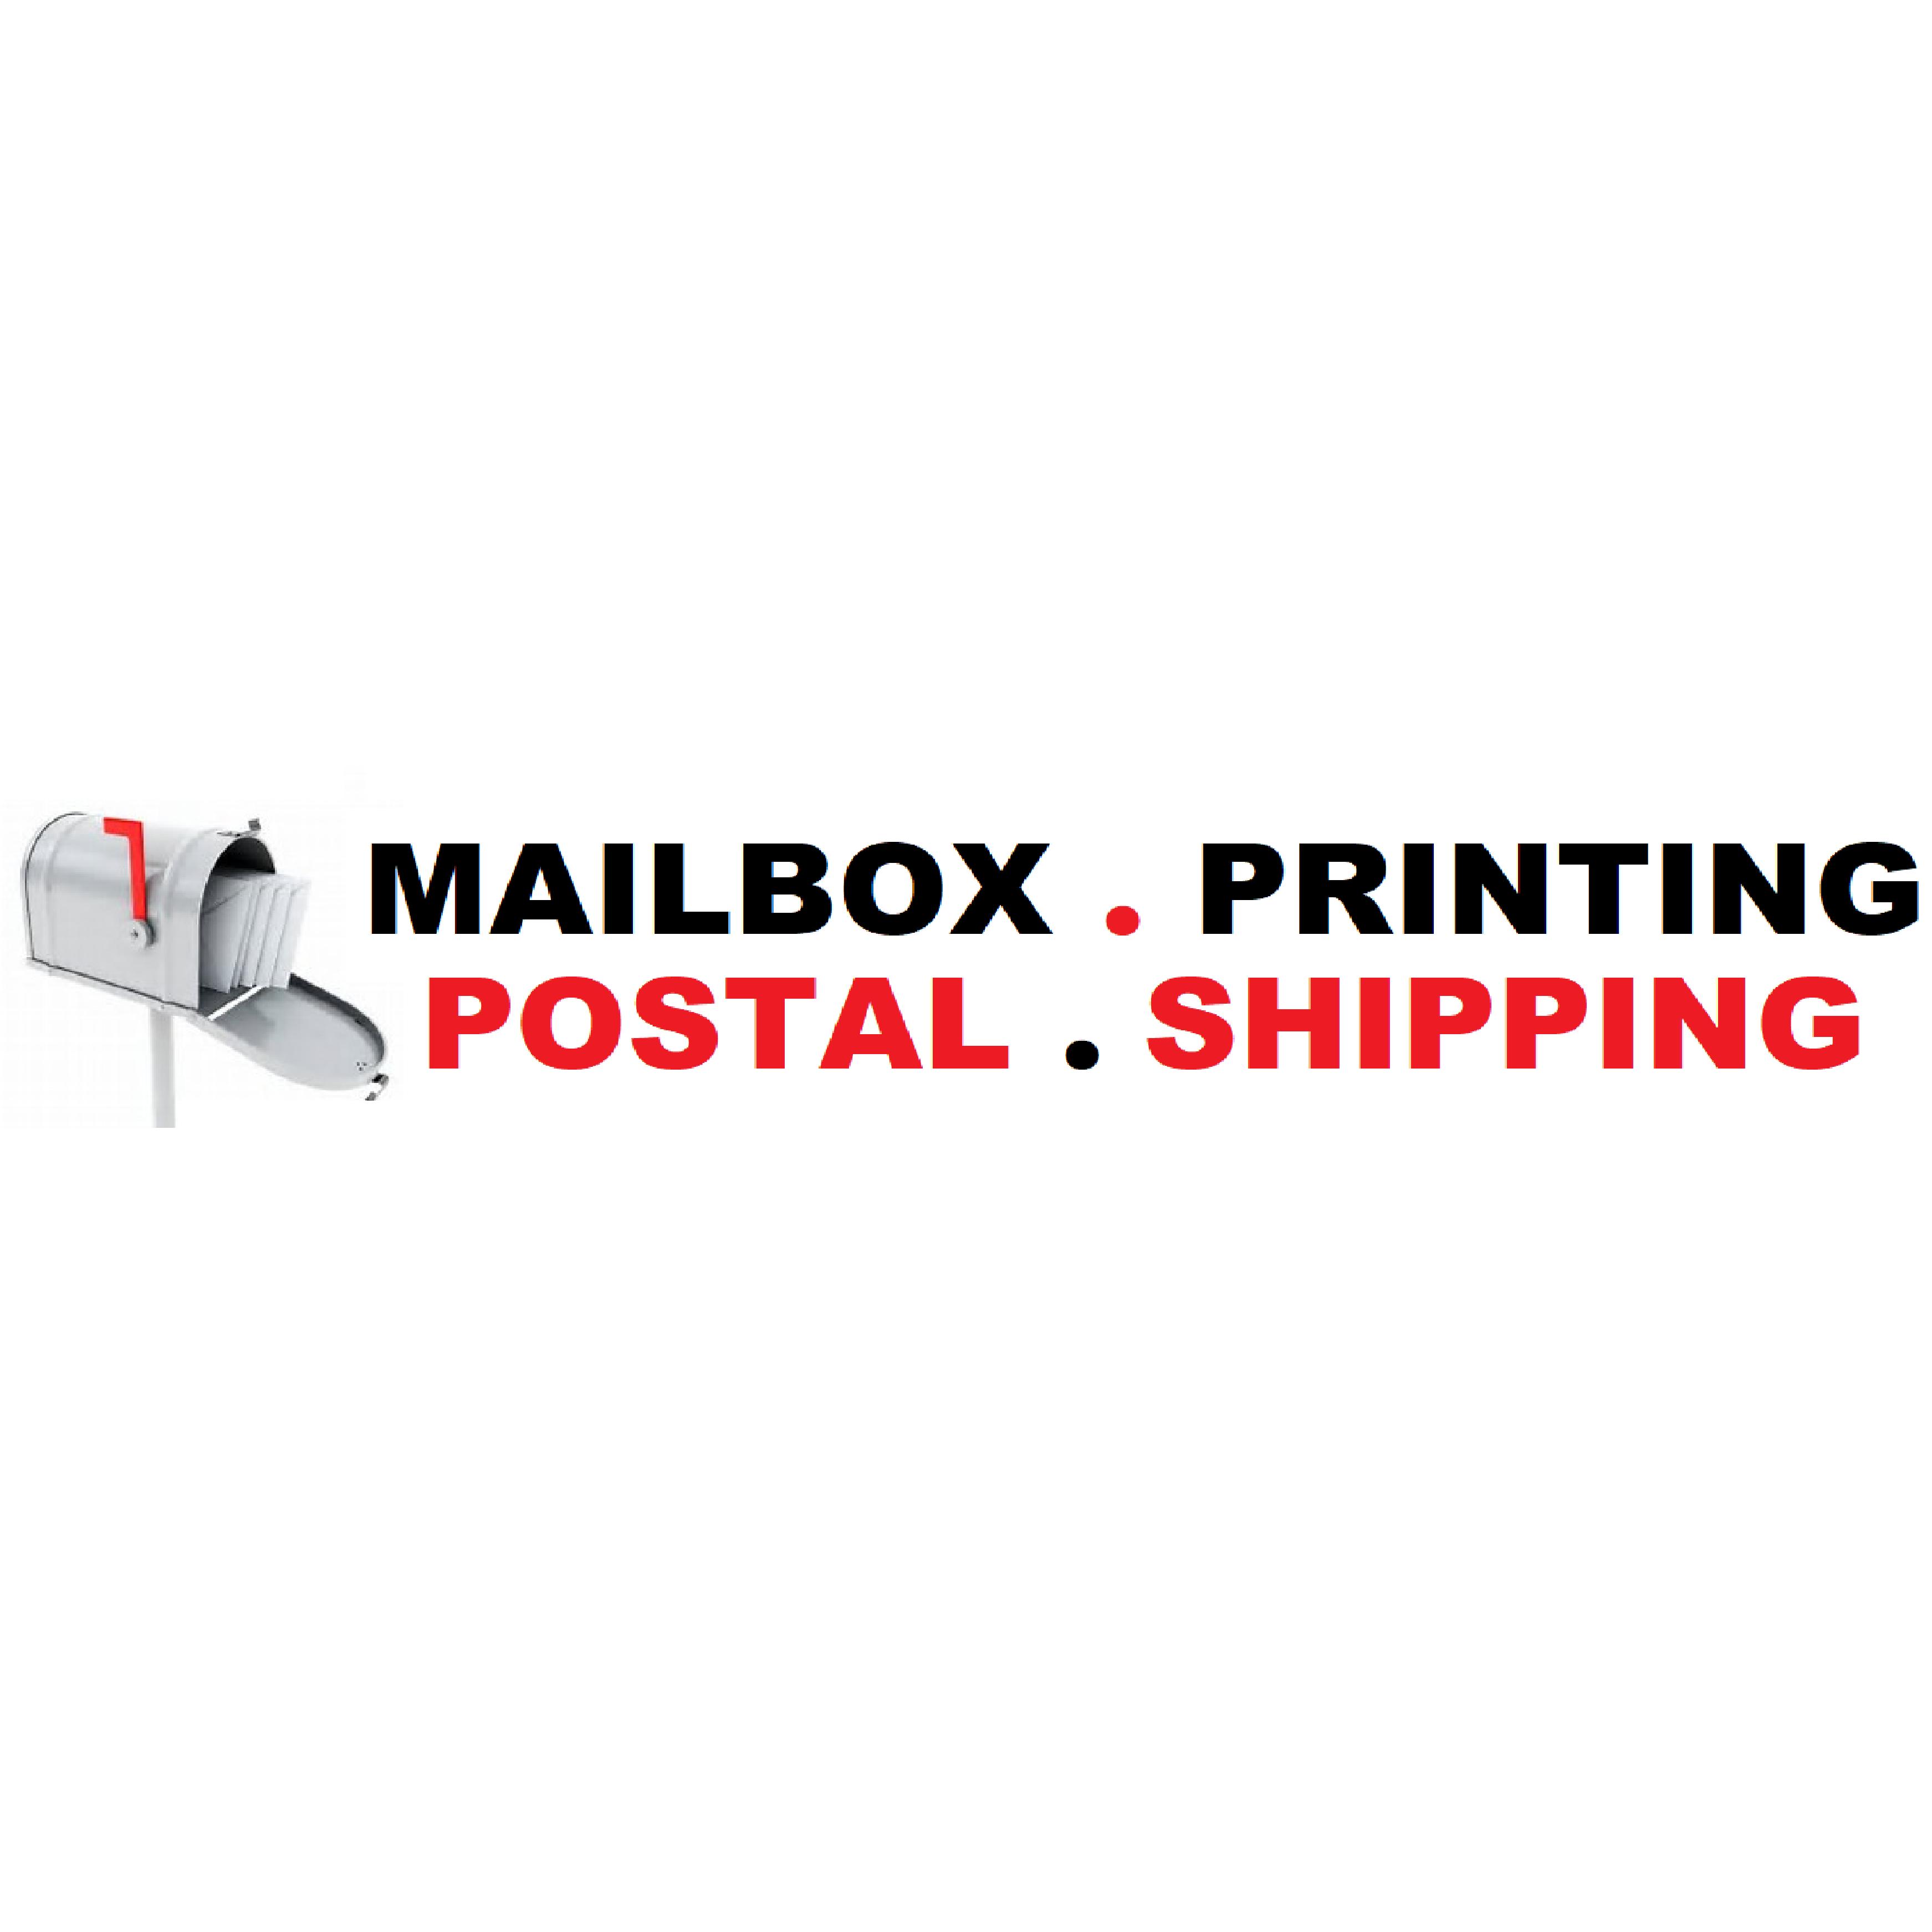 Mailbox Printing Postal Shipping